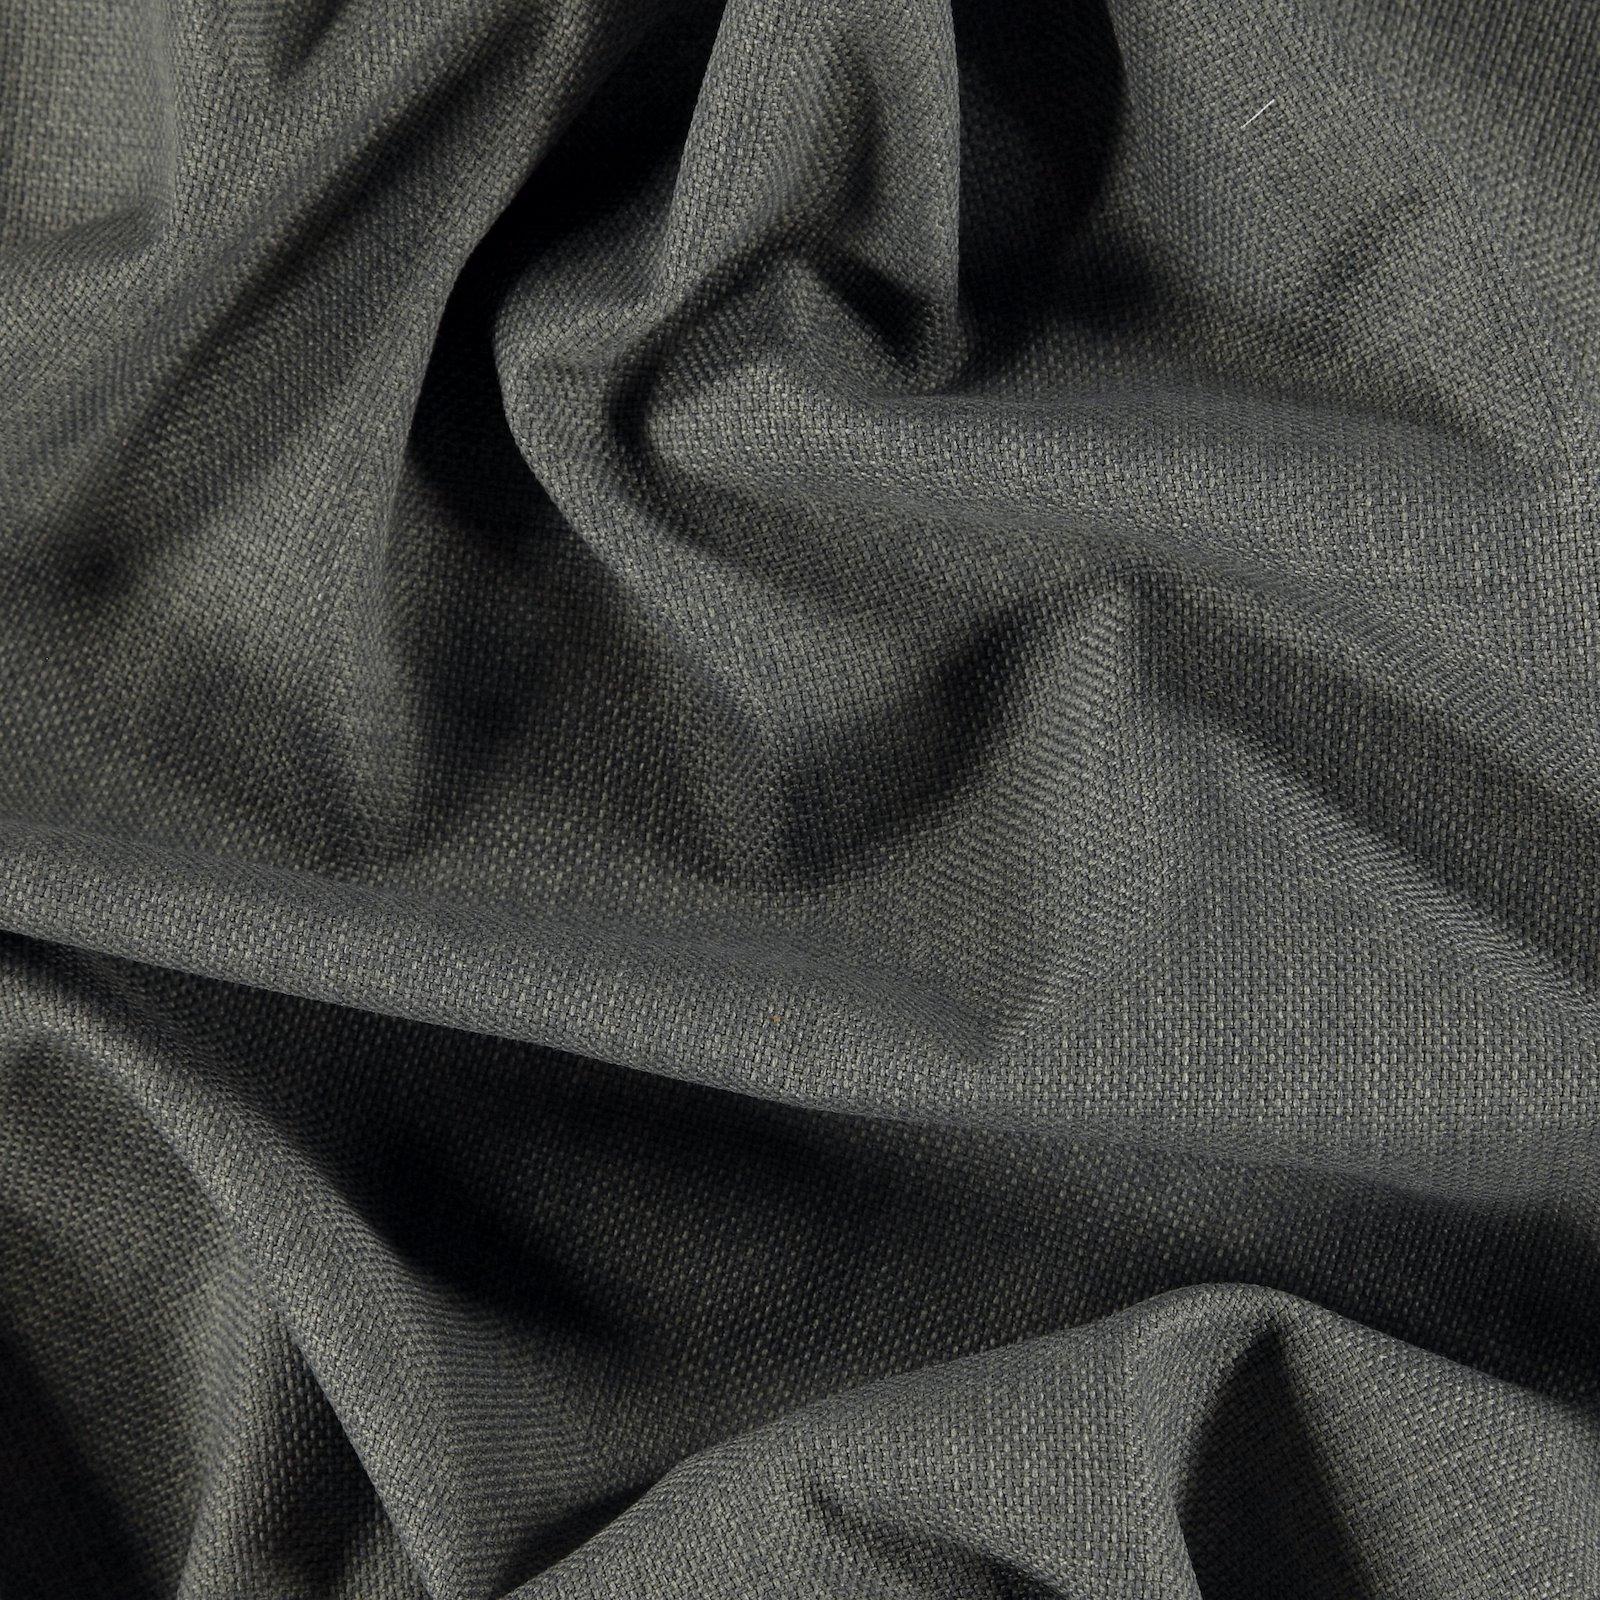 Upholstery fabric medium grey 822183_pack